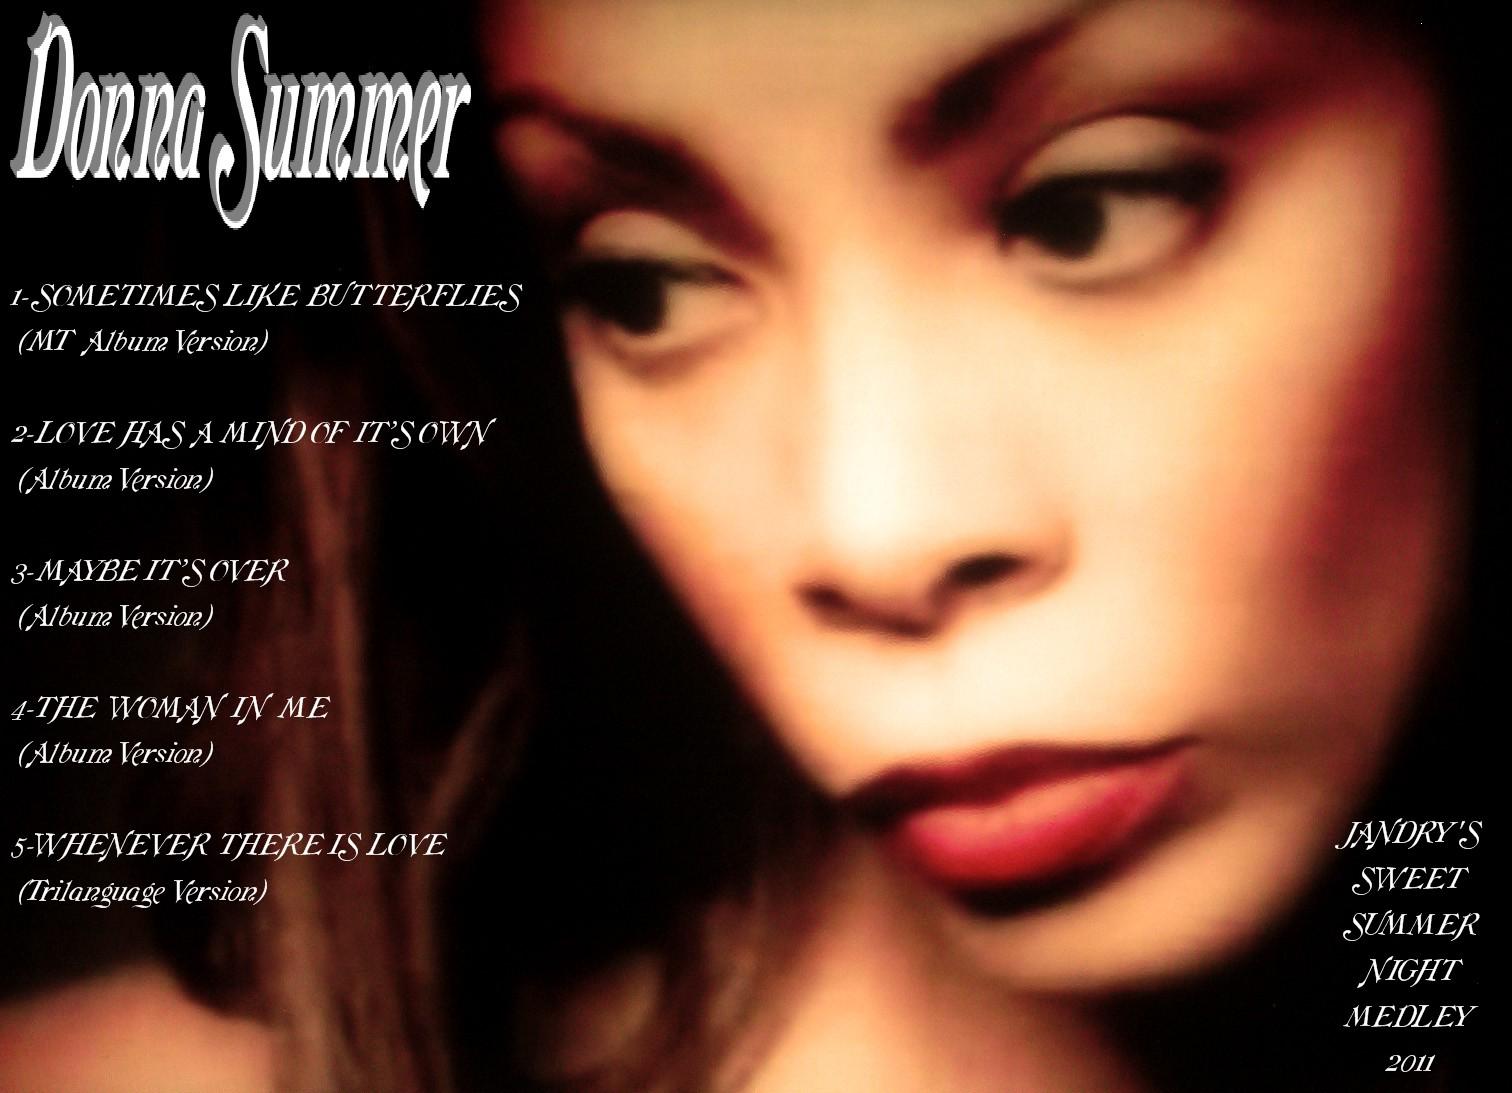 http://2.bp.blogspot.com/-btMYO424OdU/Tk3vXTcjEQI/AAAAAAAAAIs/Il0KSjMOMs4/s1600/jandry%2527s+sweet+summer+night+2011.jpg